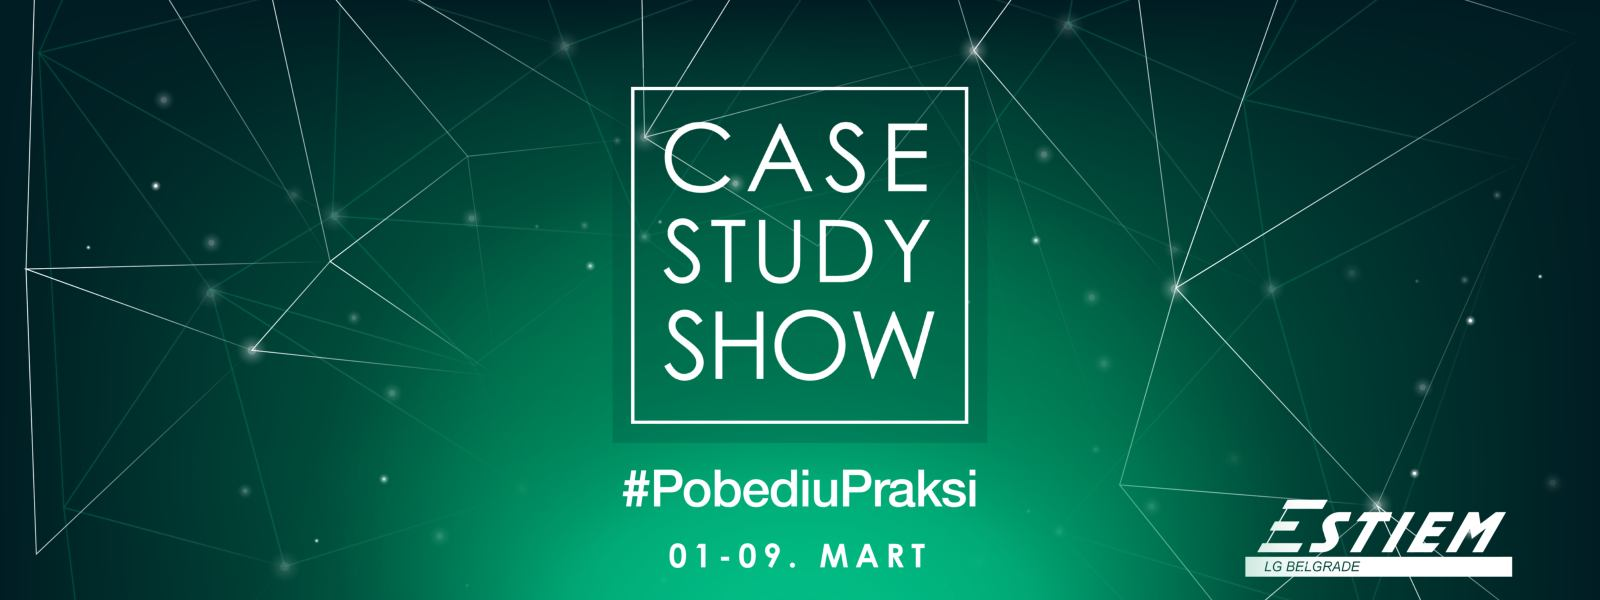 case study show estiem